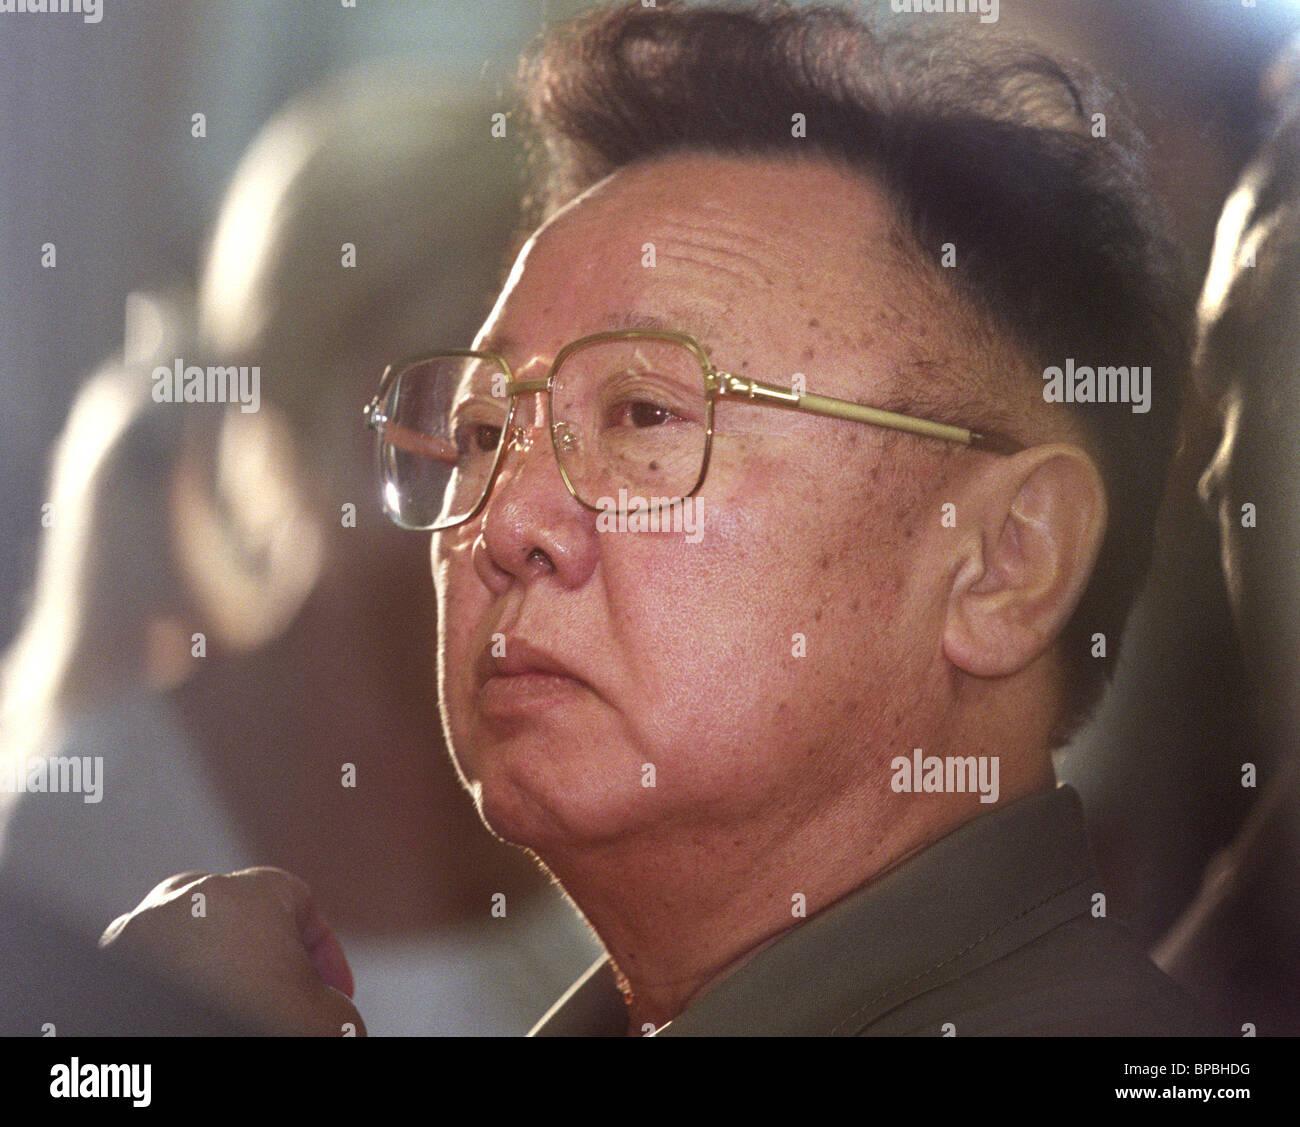 Kim Jong Il leaves Vladivostok for Pyongyang - Stock Image